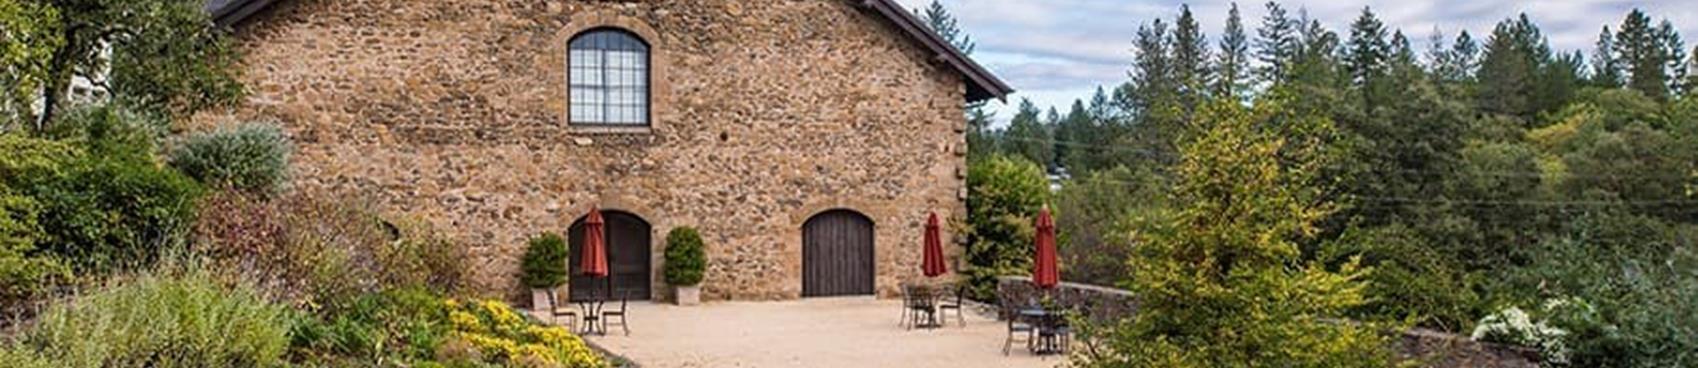 A image of CADE Estate at the Thirteenth Vineyard